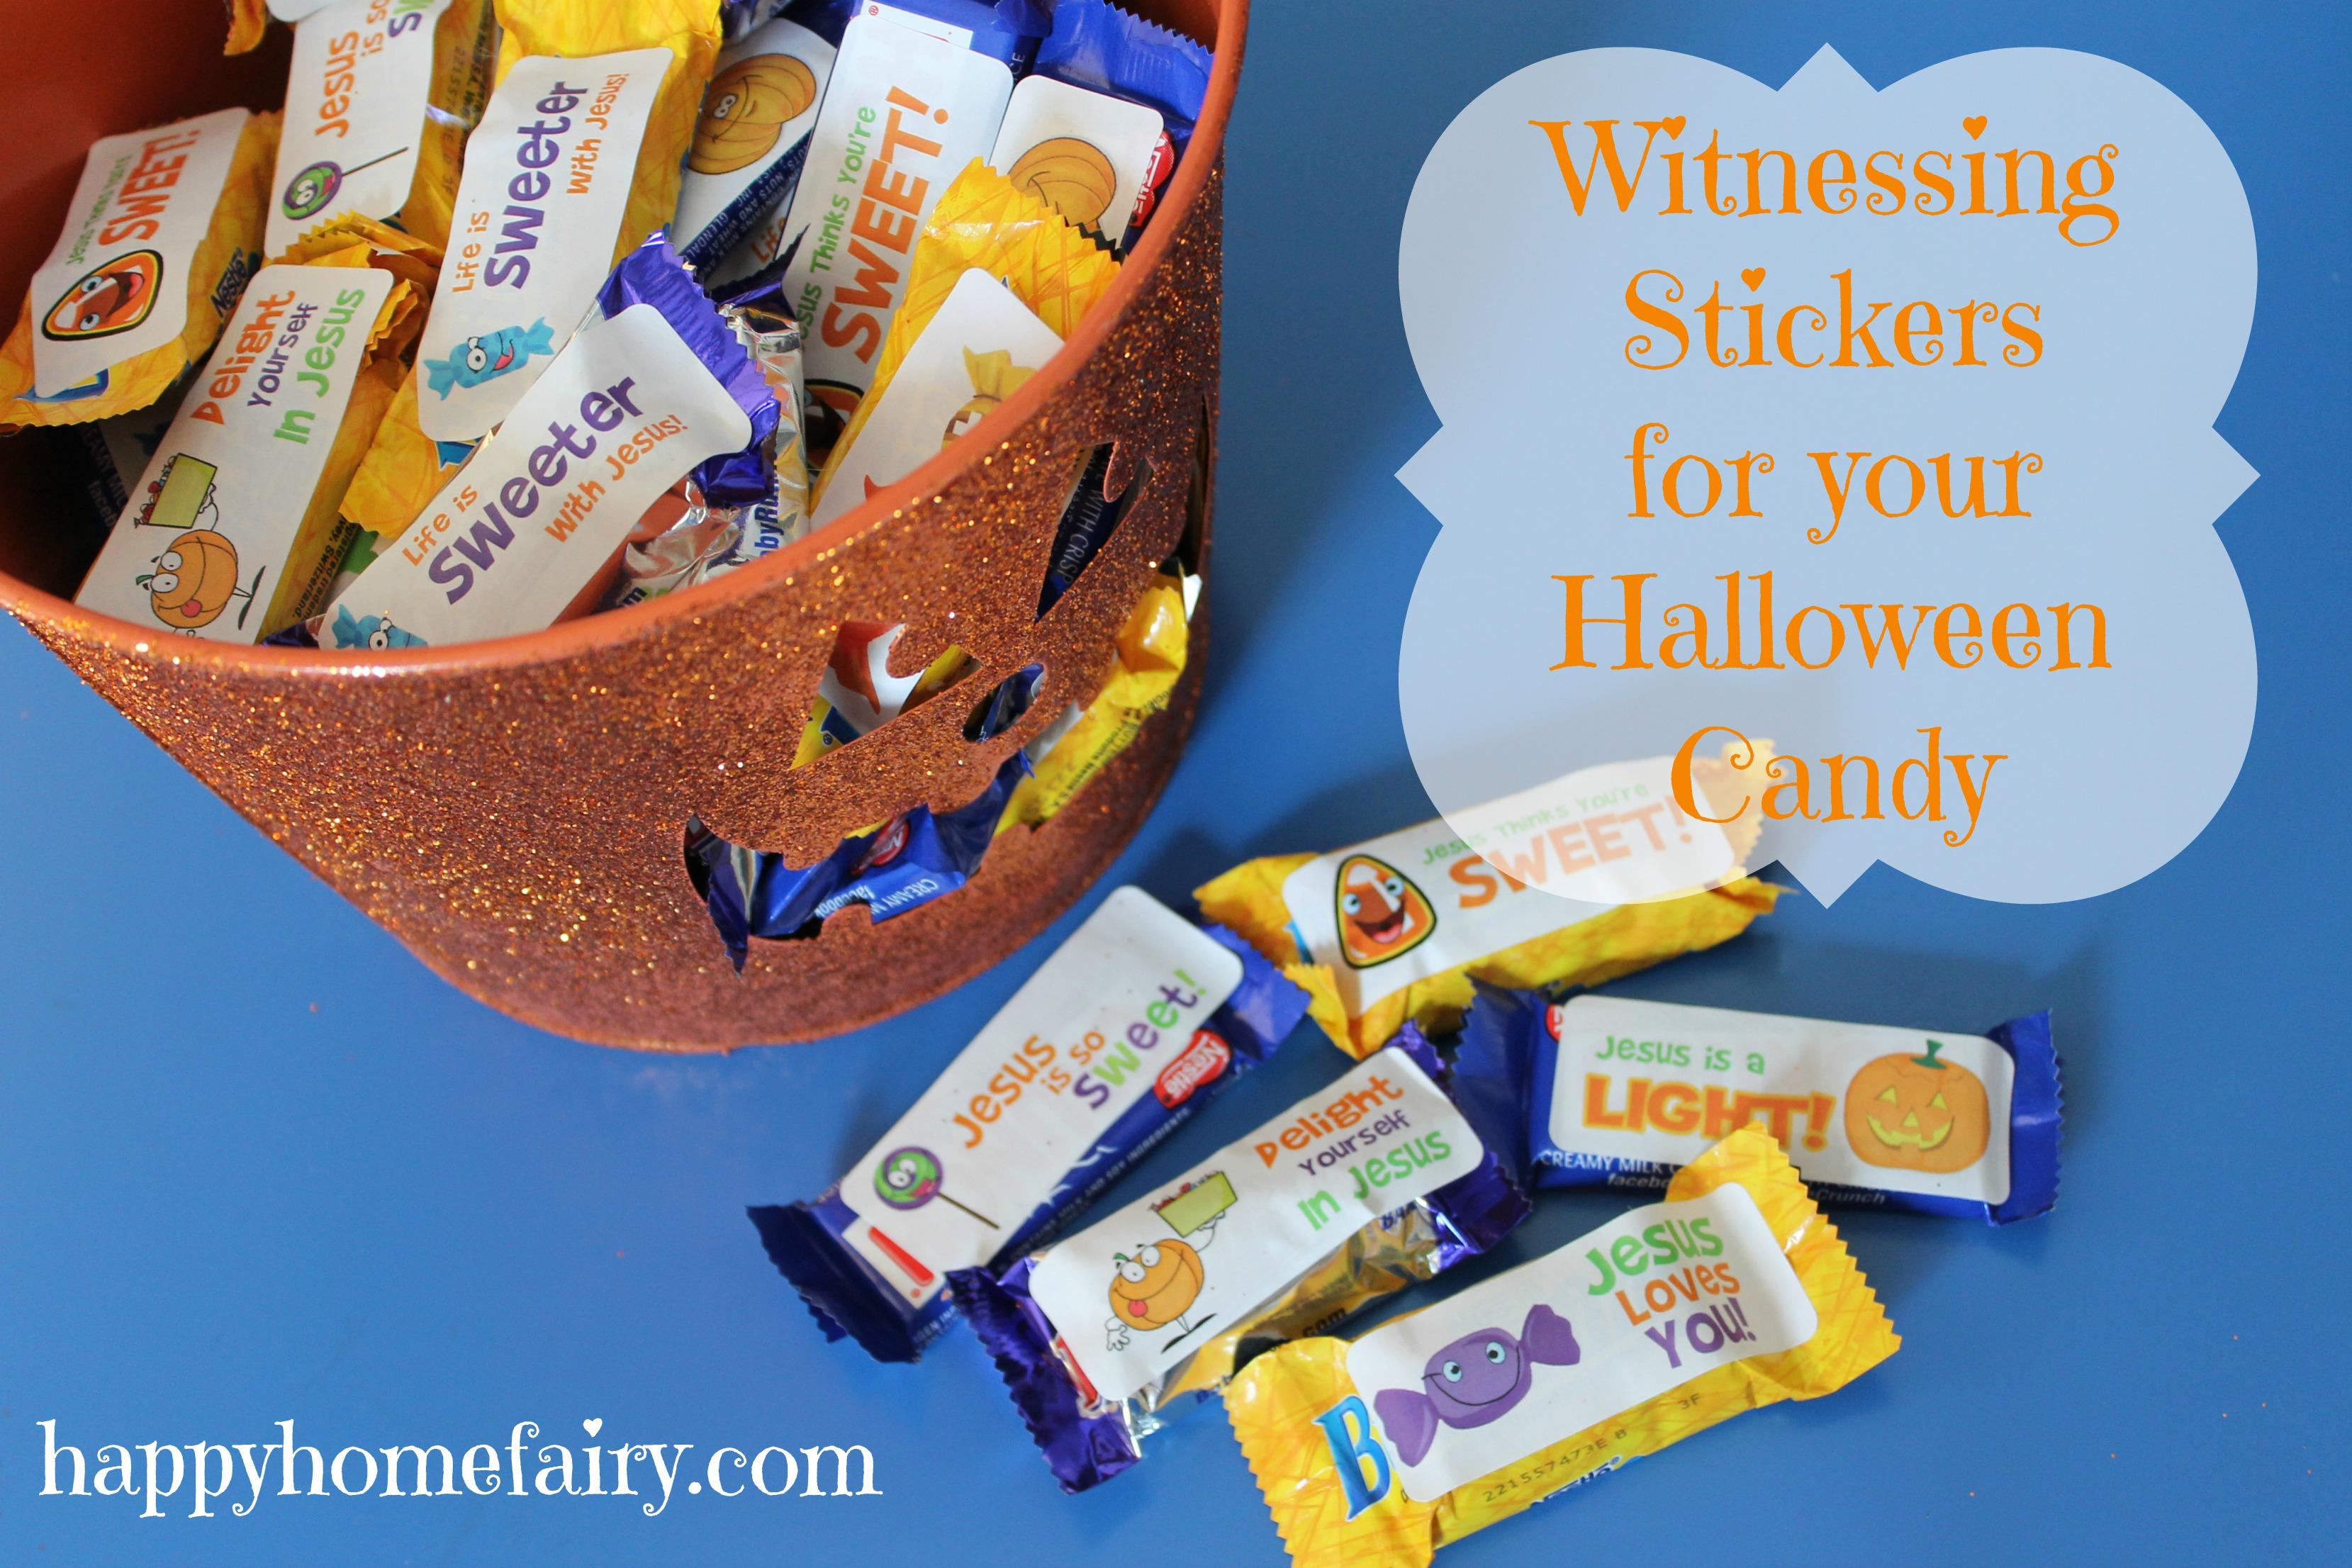 Christian halloween giveaways for children